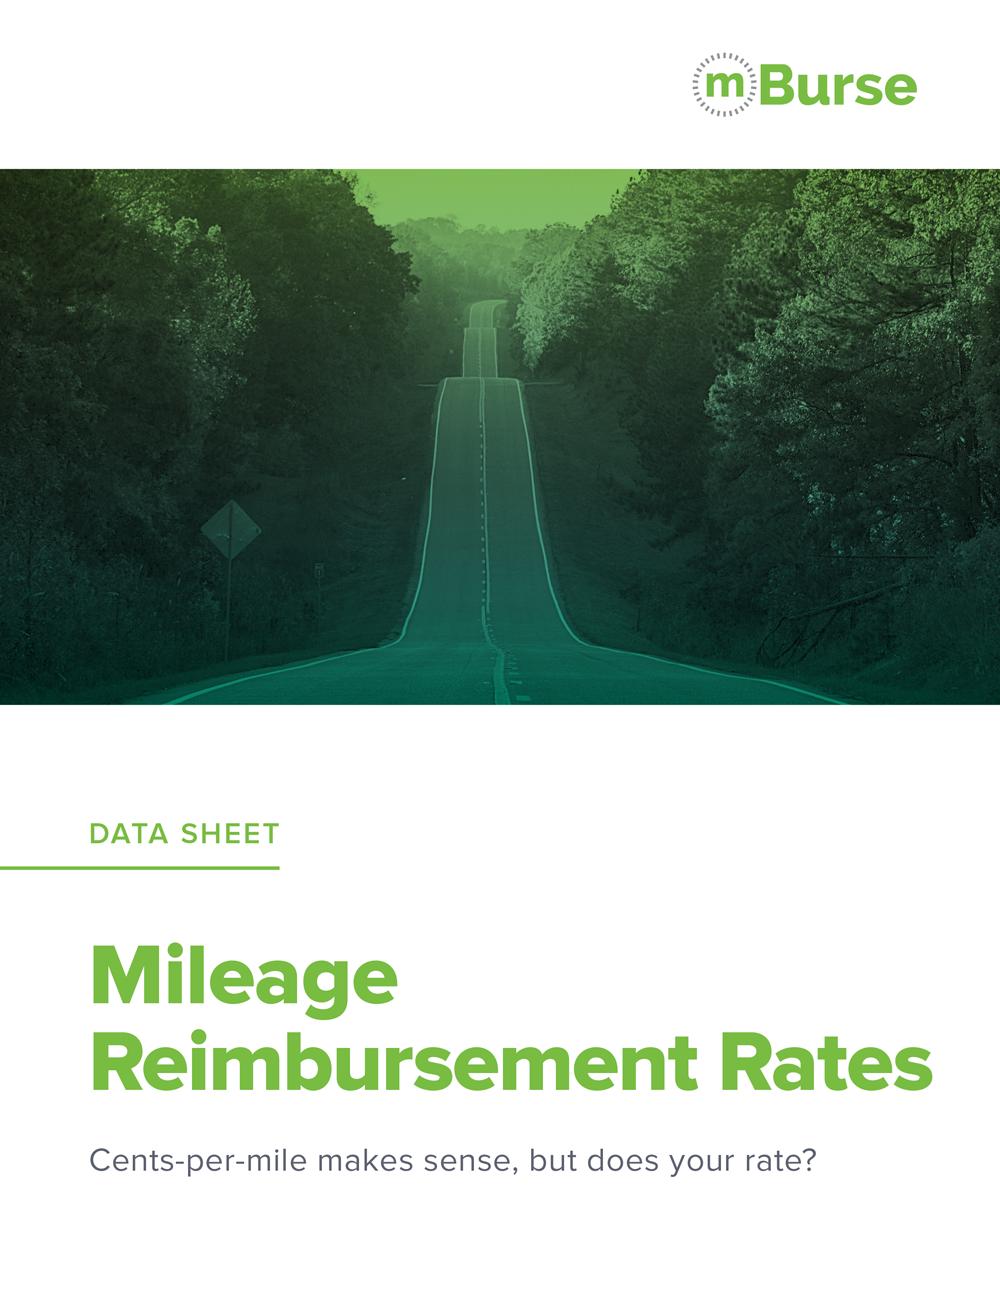 mBurse Mileage Reimbursement data sheet